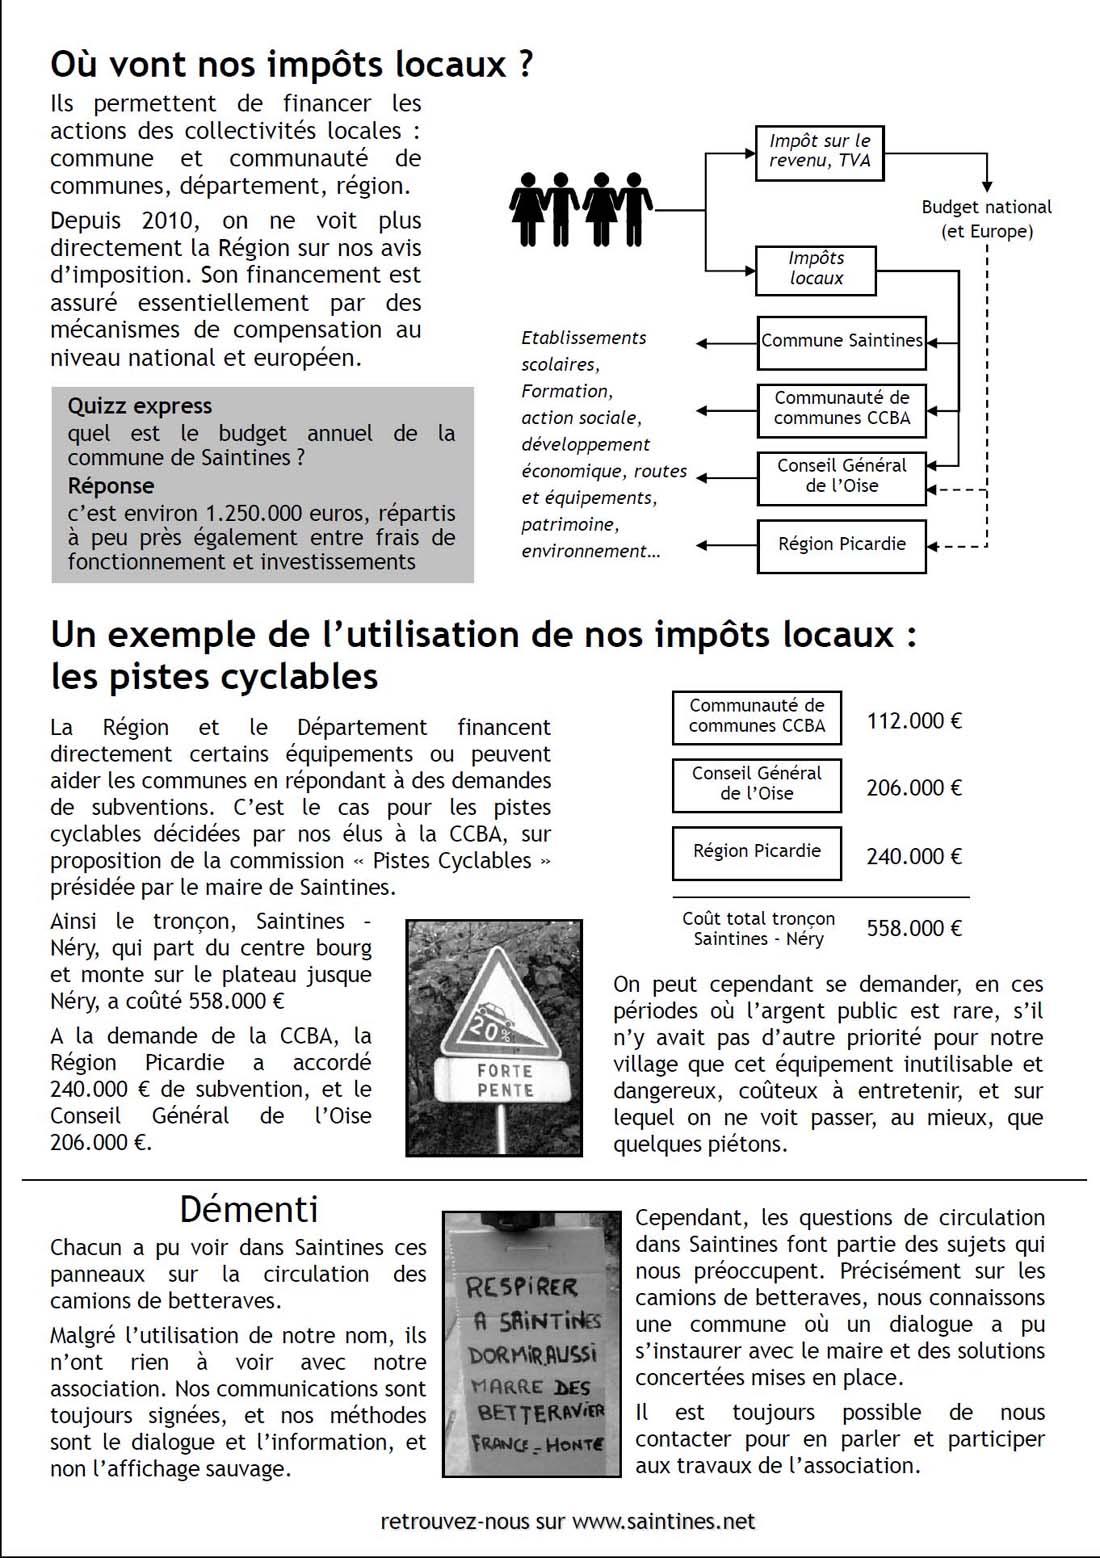 Lettre Respirer à Saintines Nov 2013 page 2